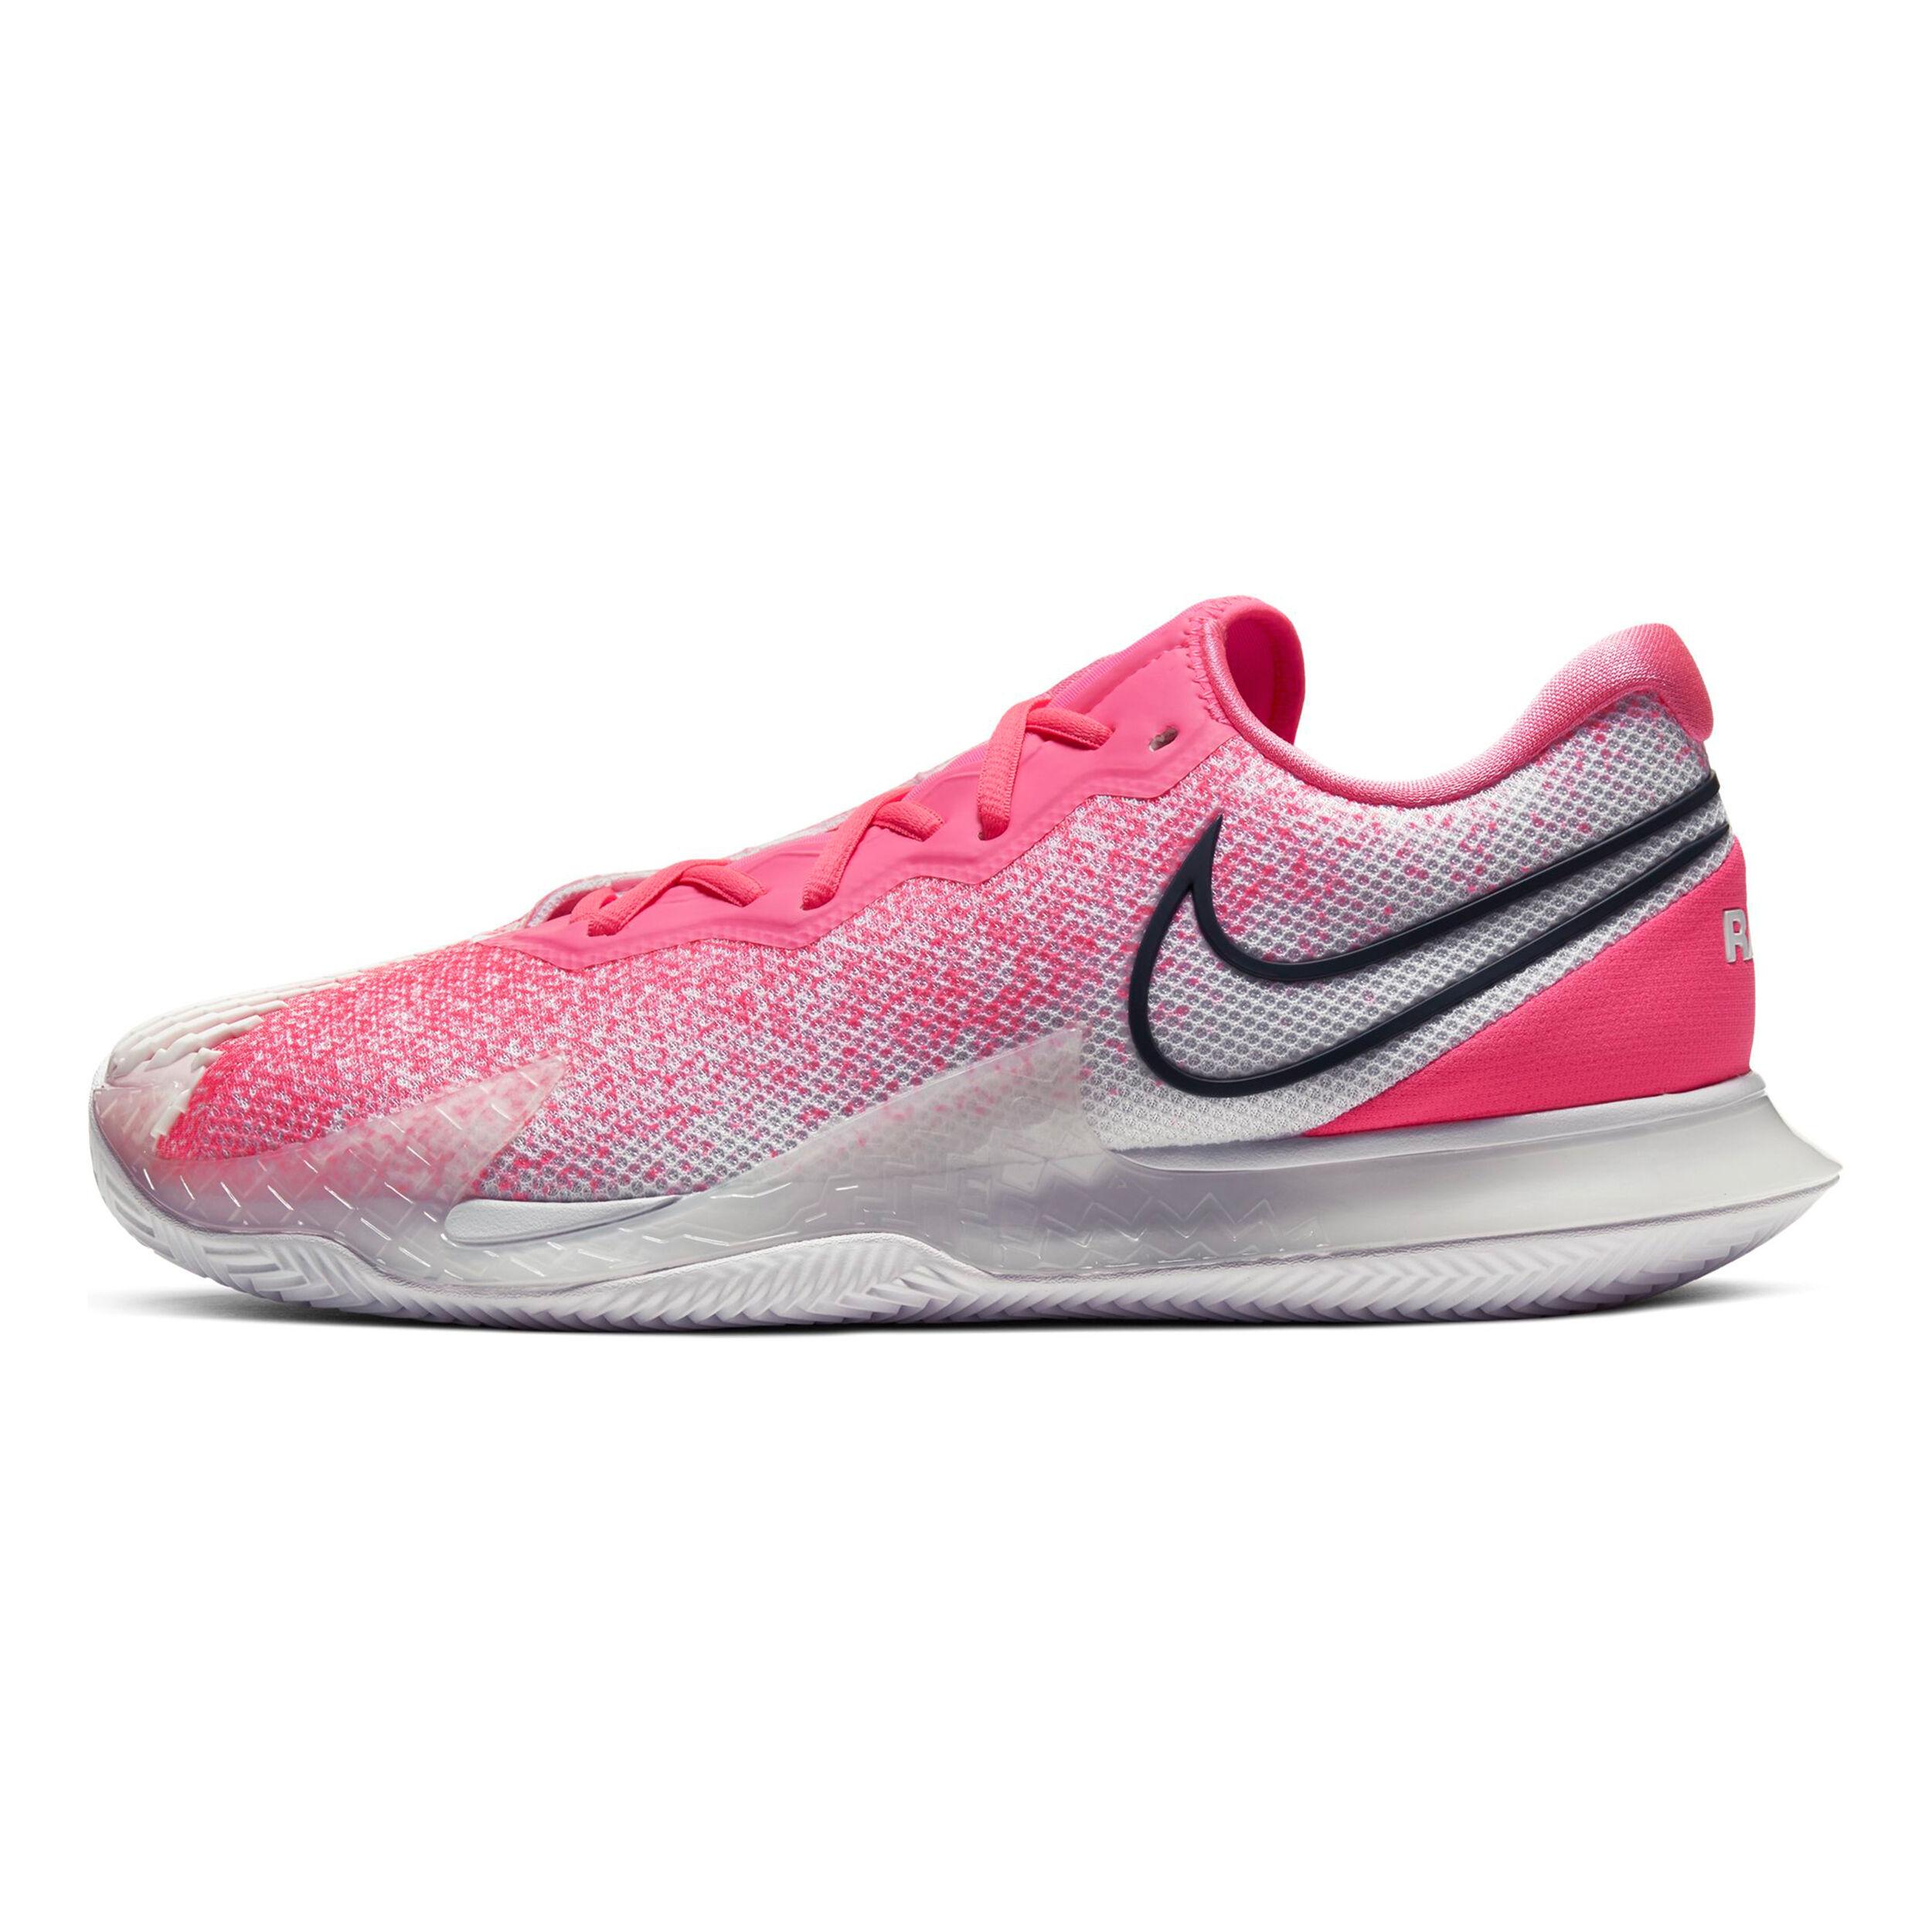 Nike Rafael Nadal Air Zoom Vapor Cage 4 Clay Chaussure Terre ...